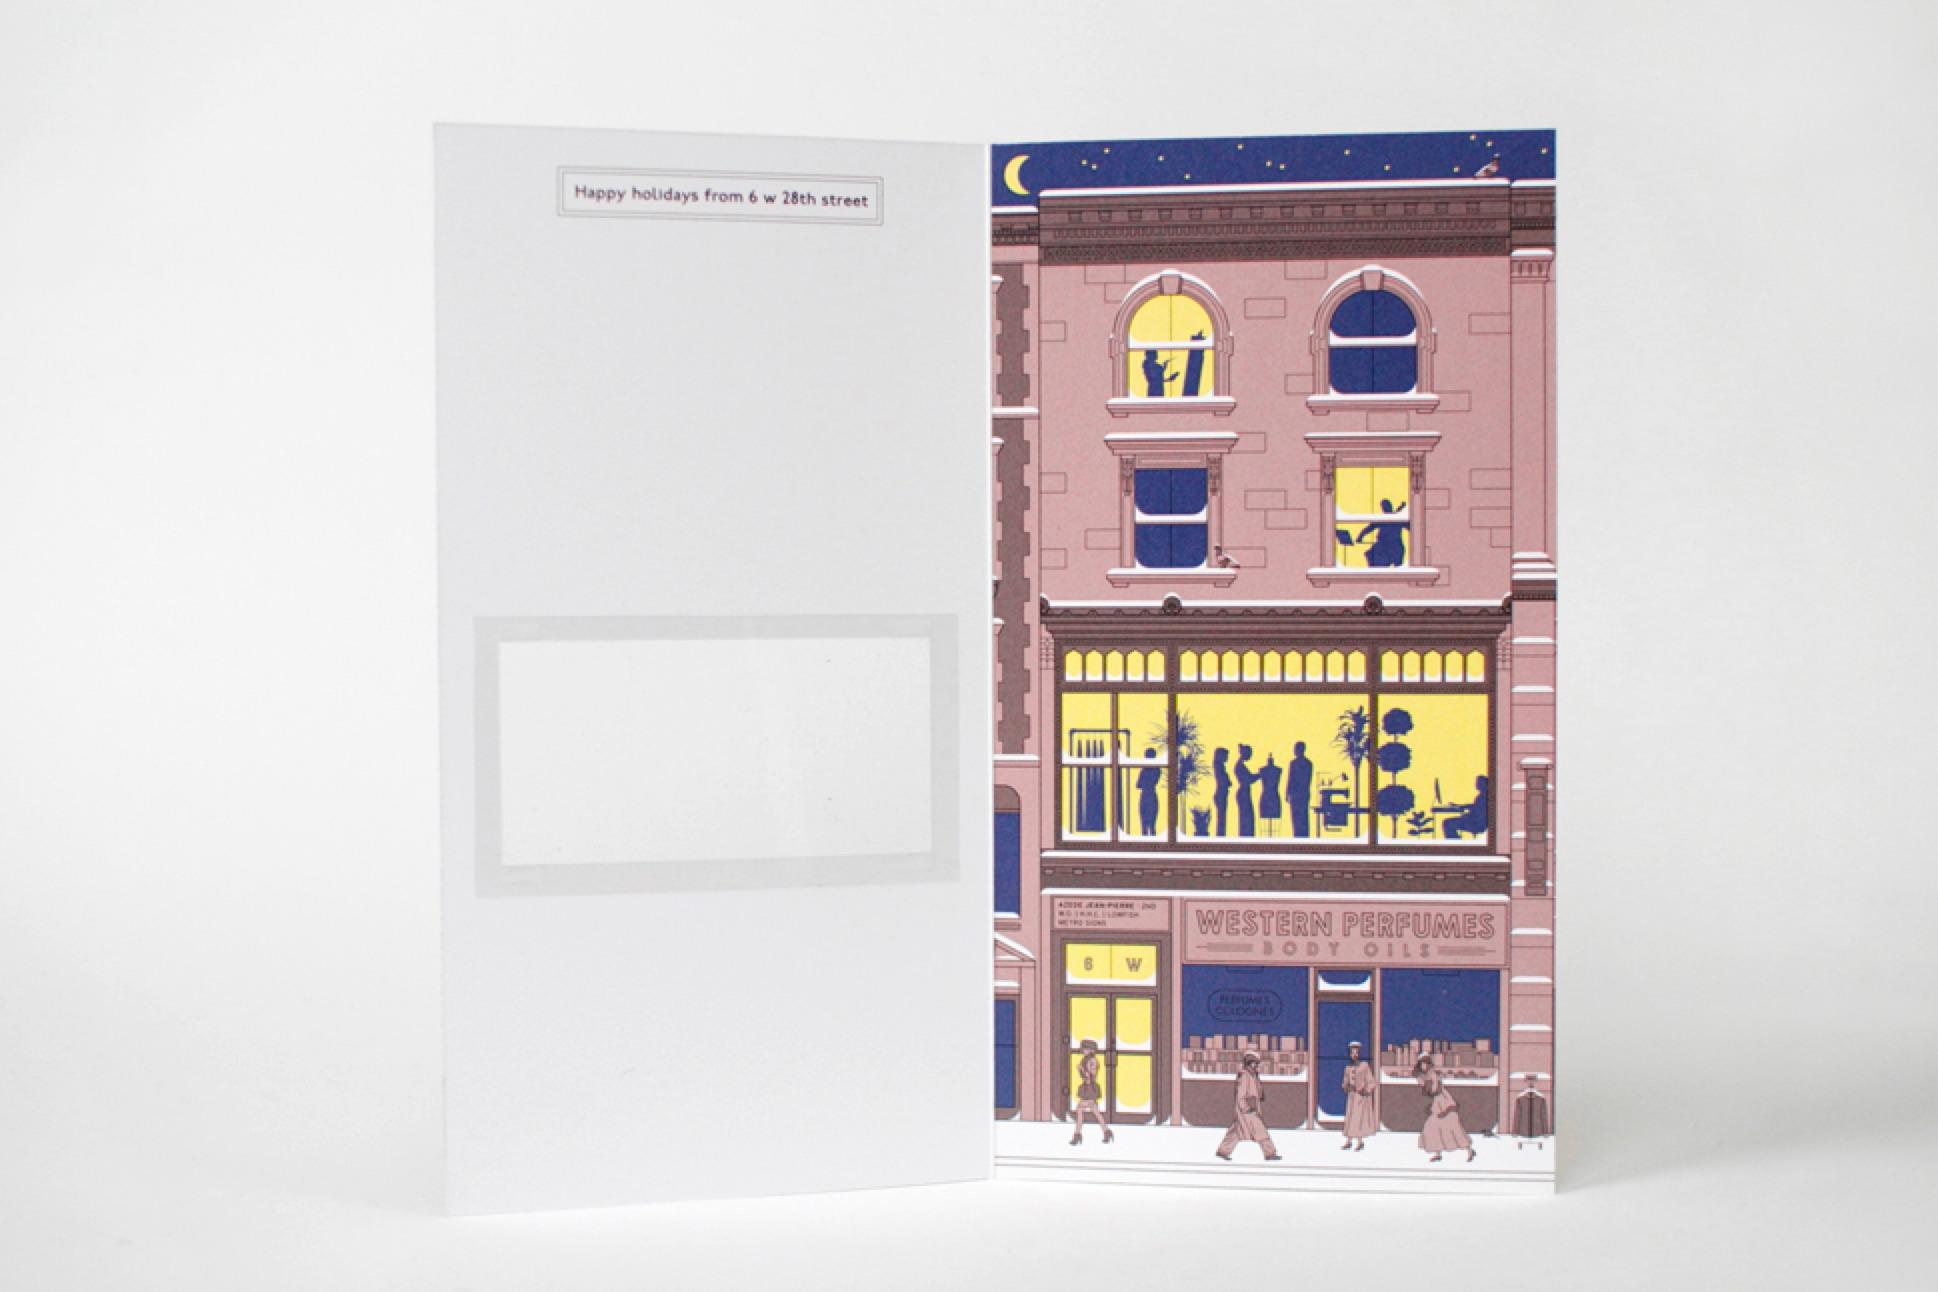 fashion label holiday card